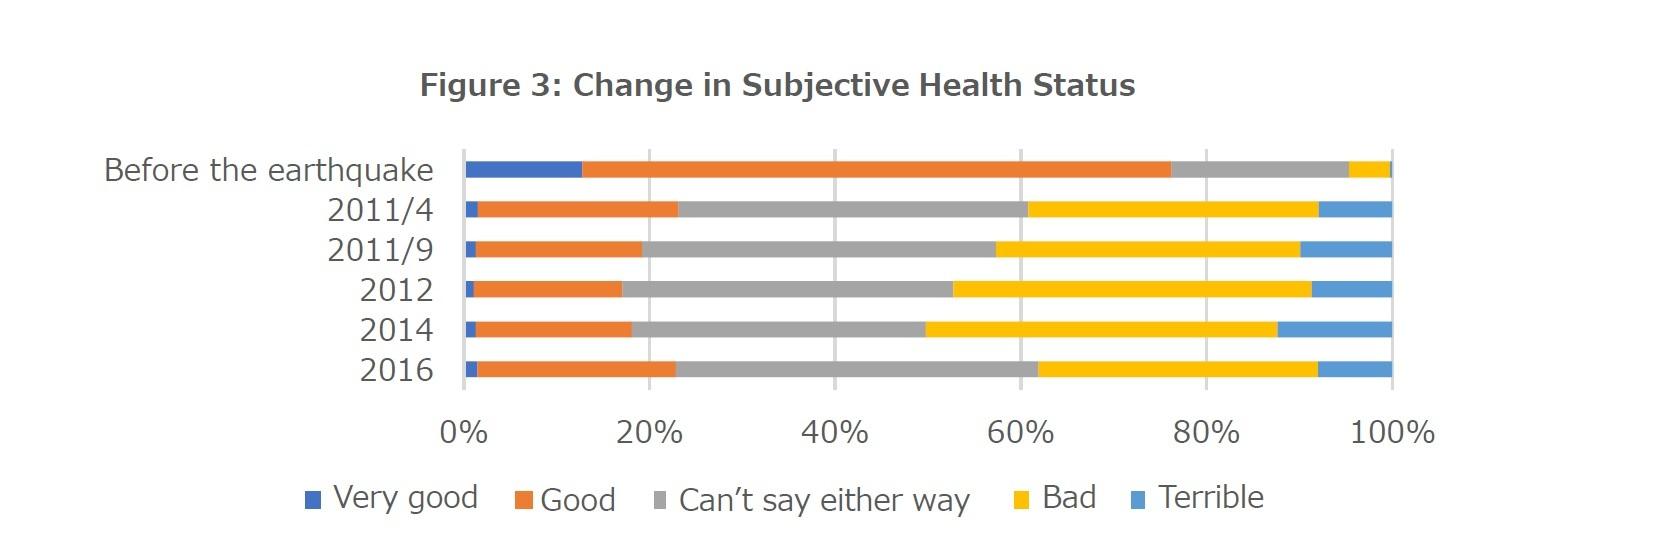 Figure 3: Change in Subjective Health Status